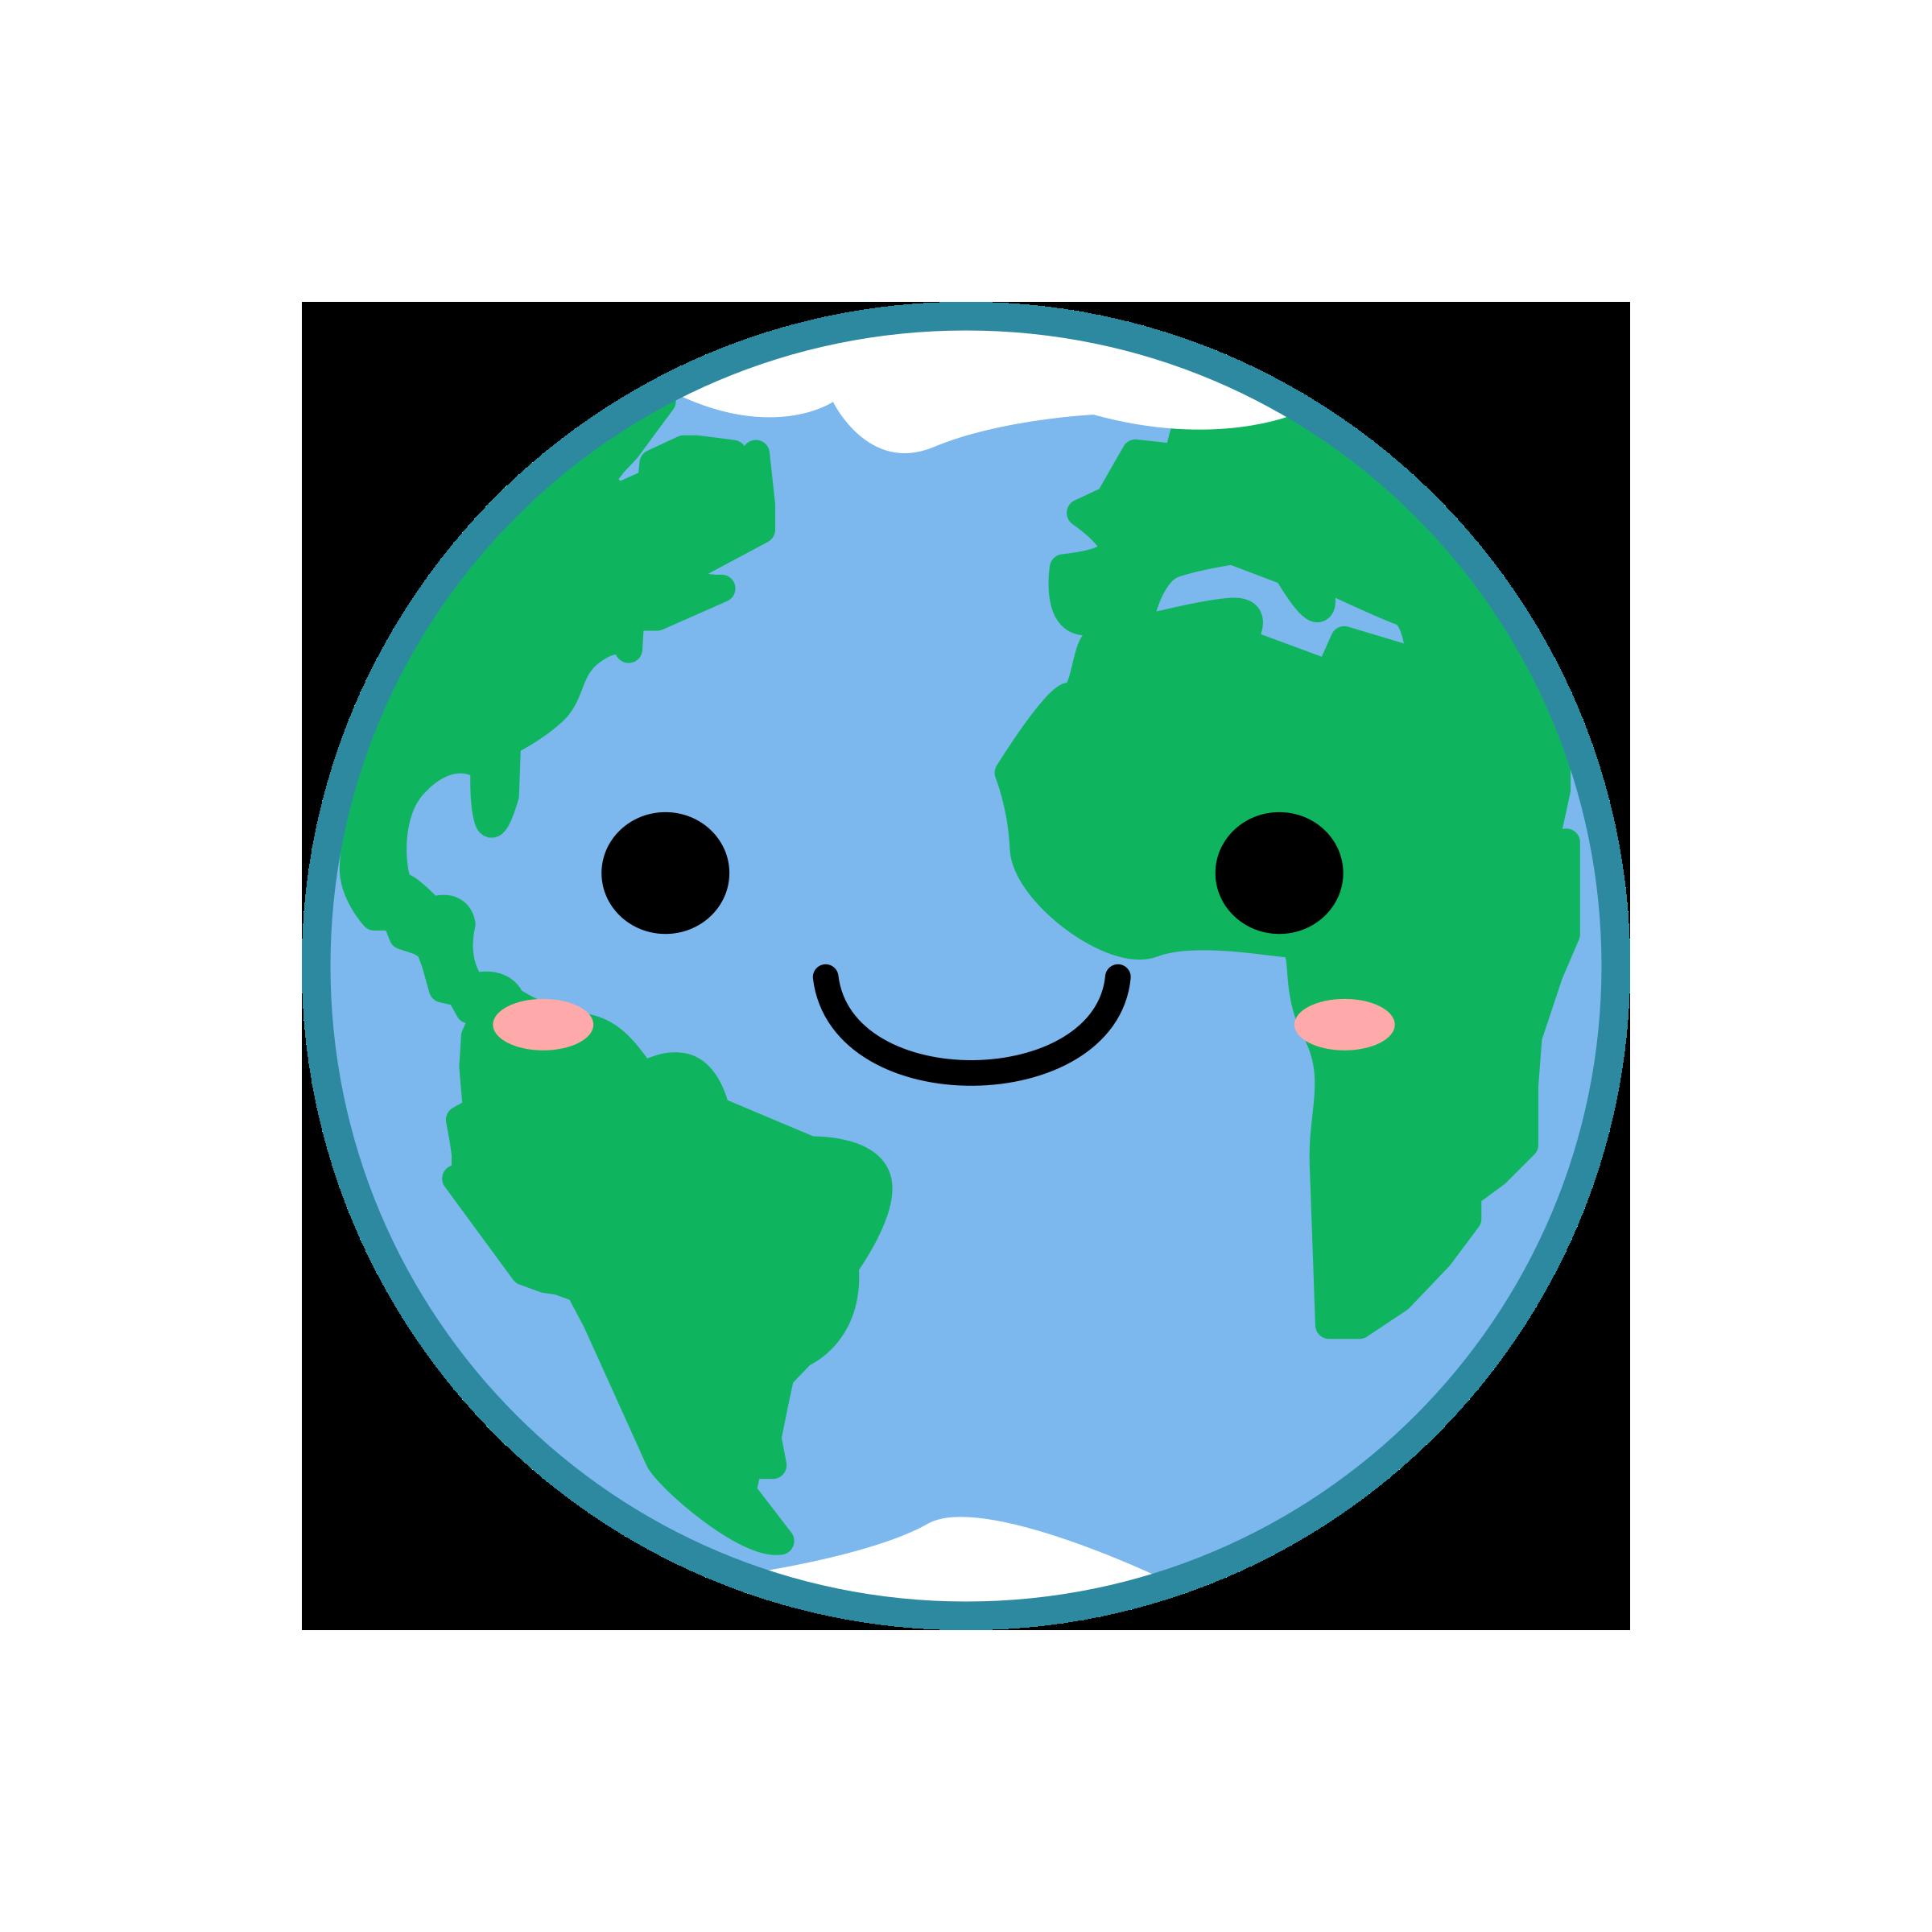 2400x2400 Kawaii Earth Vector Clipart Image